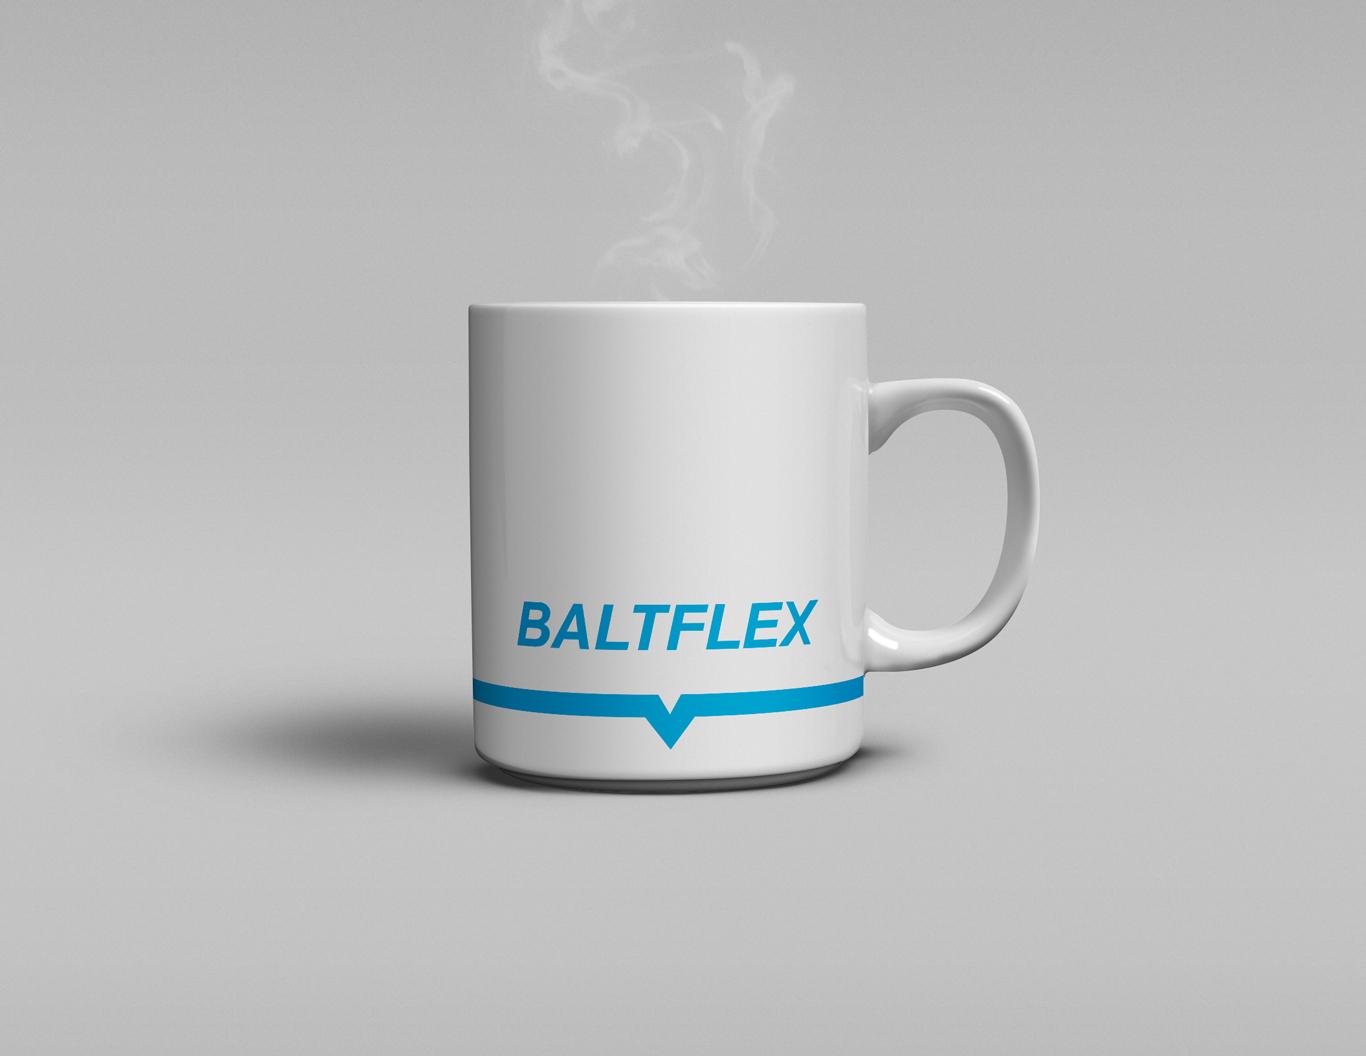 baltflex-Classic-Cup-Mock-up